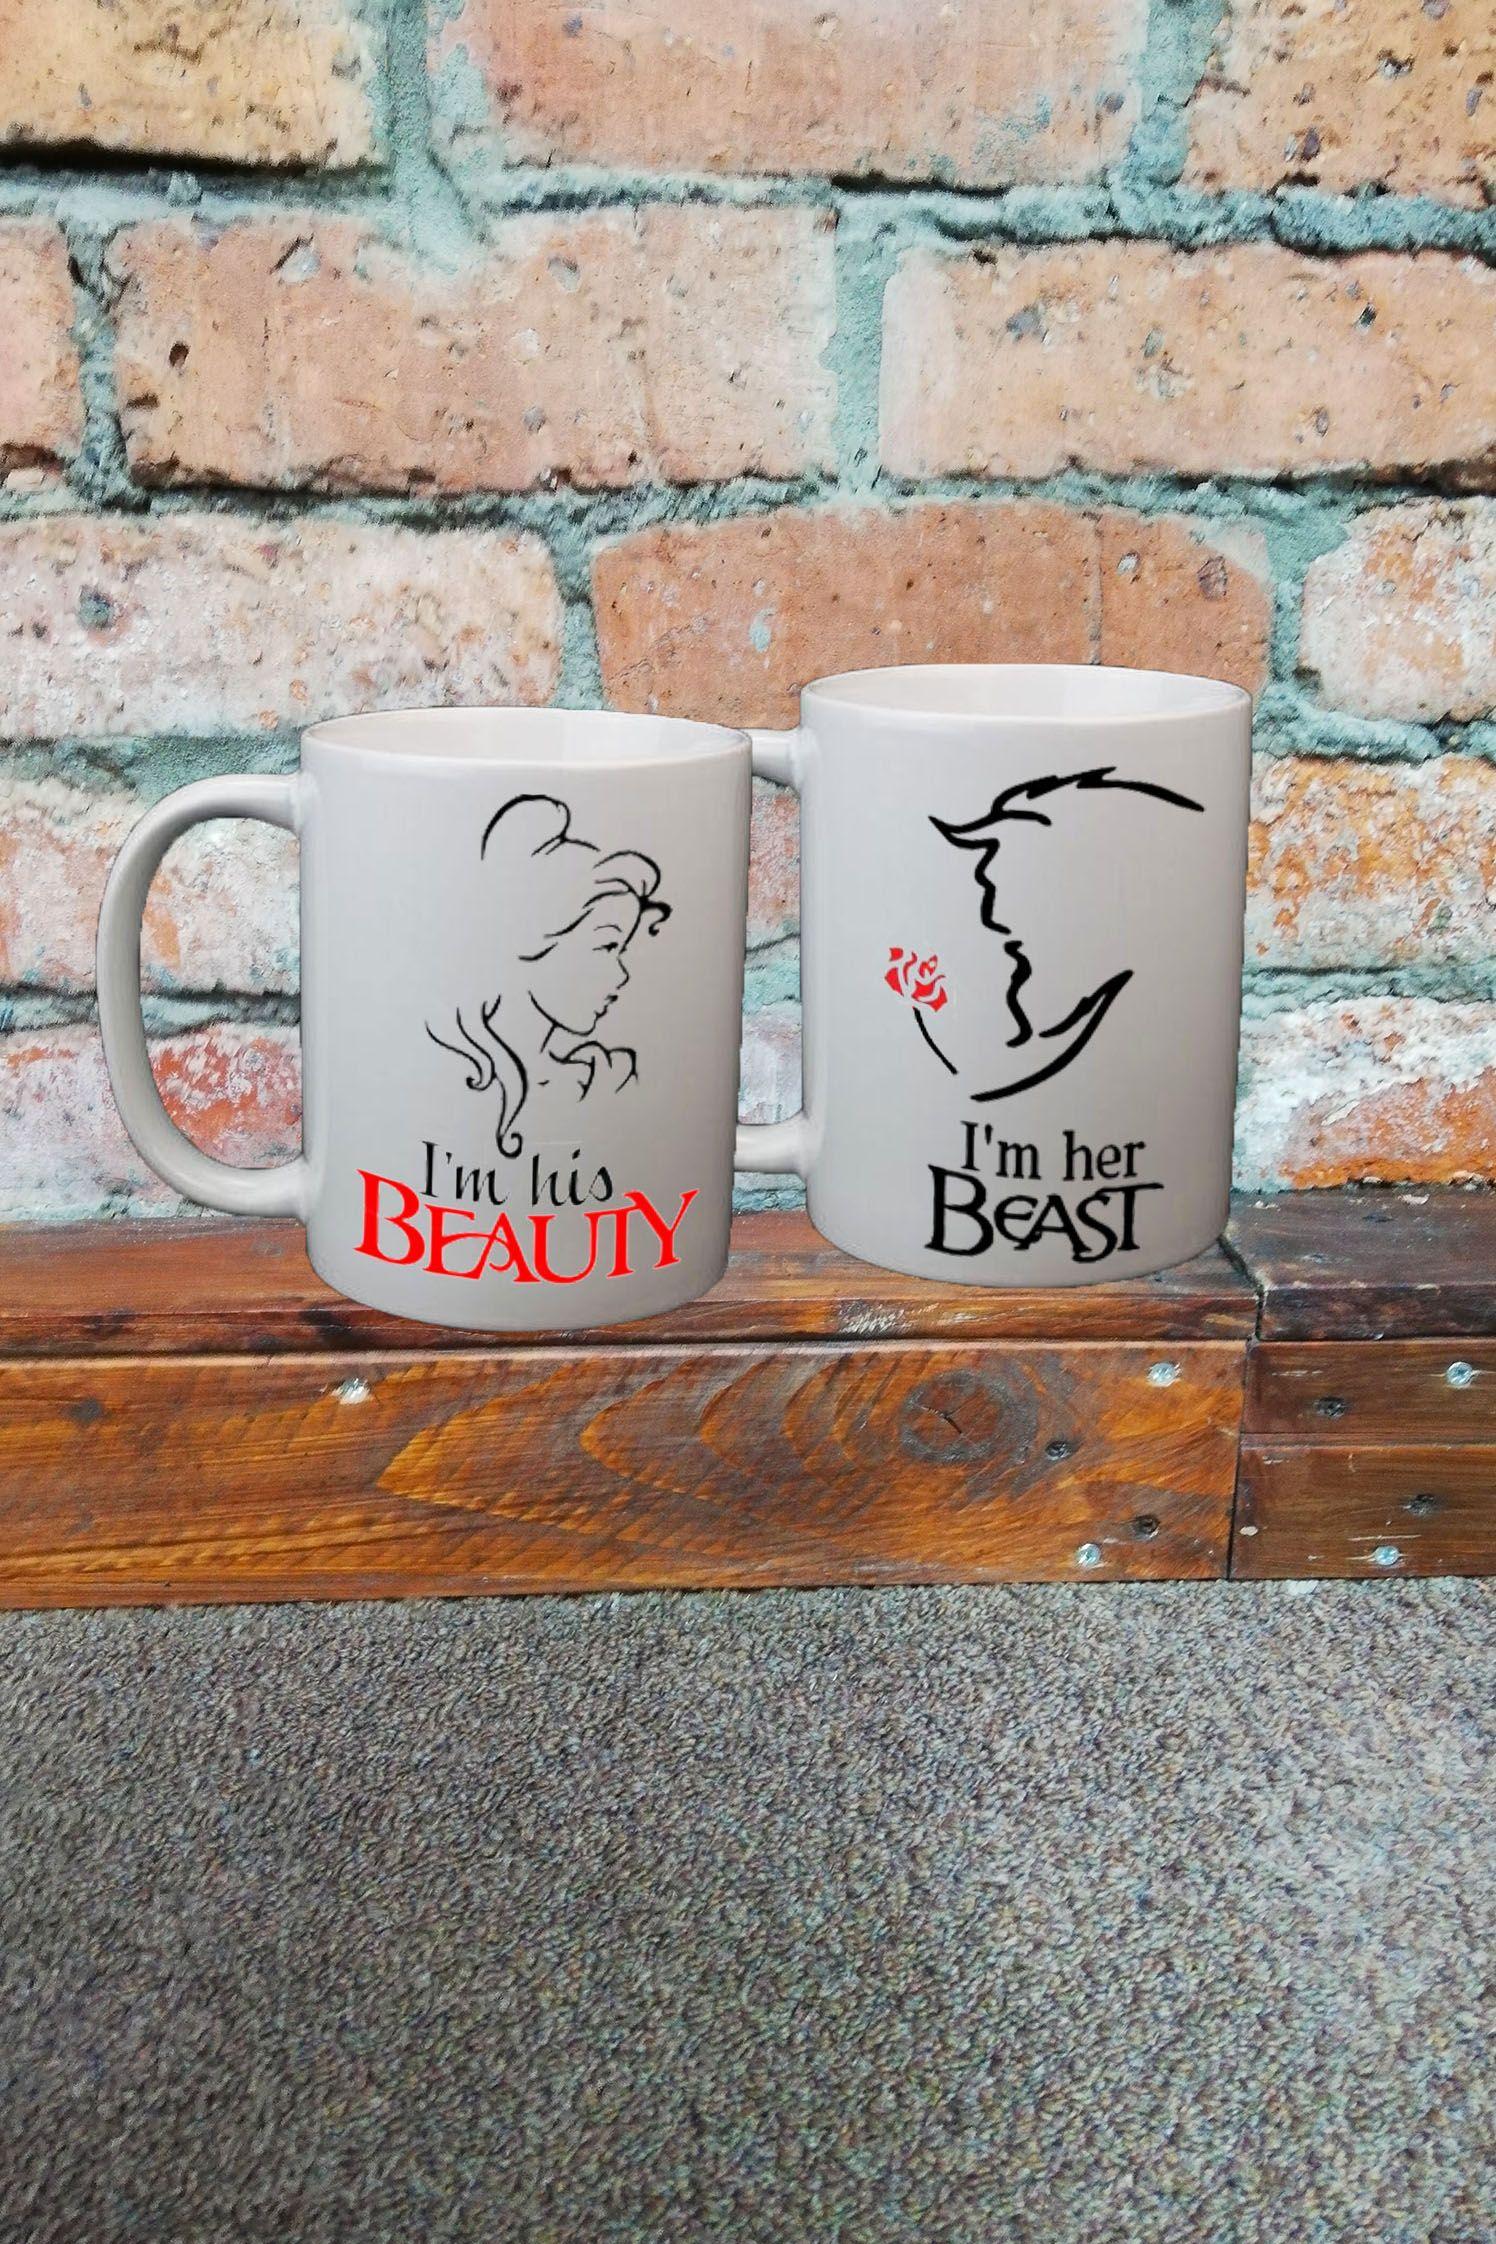 Her Beast His Beauty 11oz Mug Set Mugs, Couple mugs